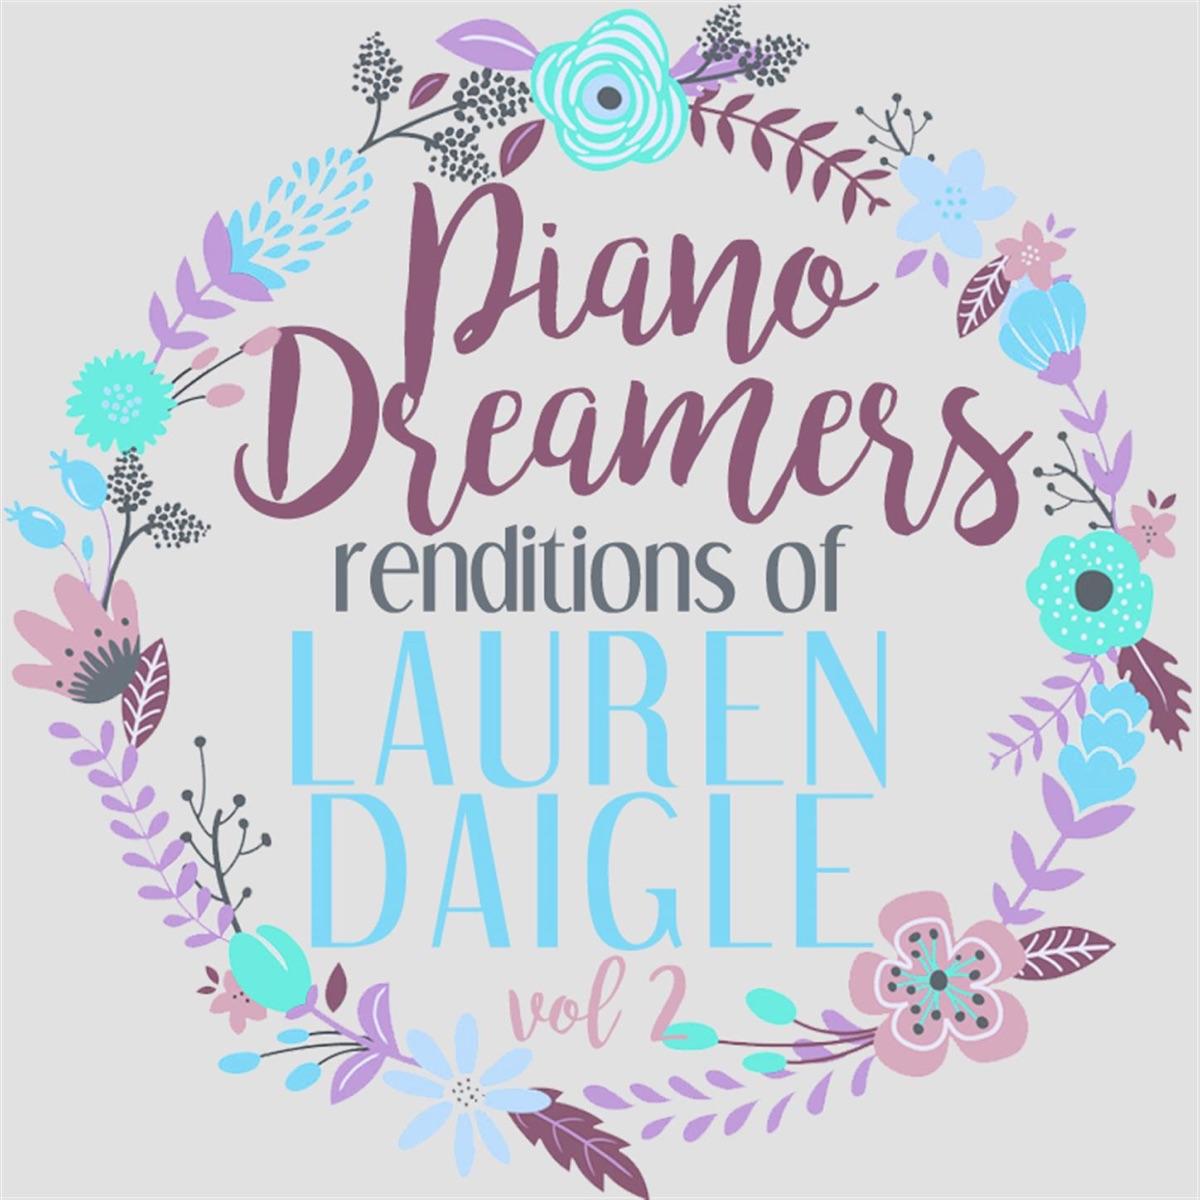 Piano Dreamers Renditions of Lauren Daigle Vol 2 Instrumental Piano Dreamers CD cover